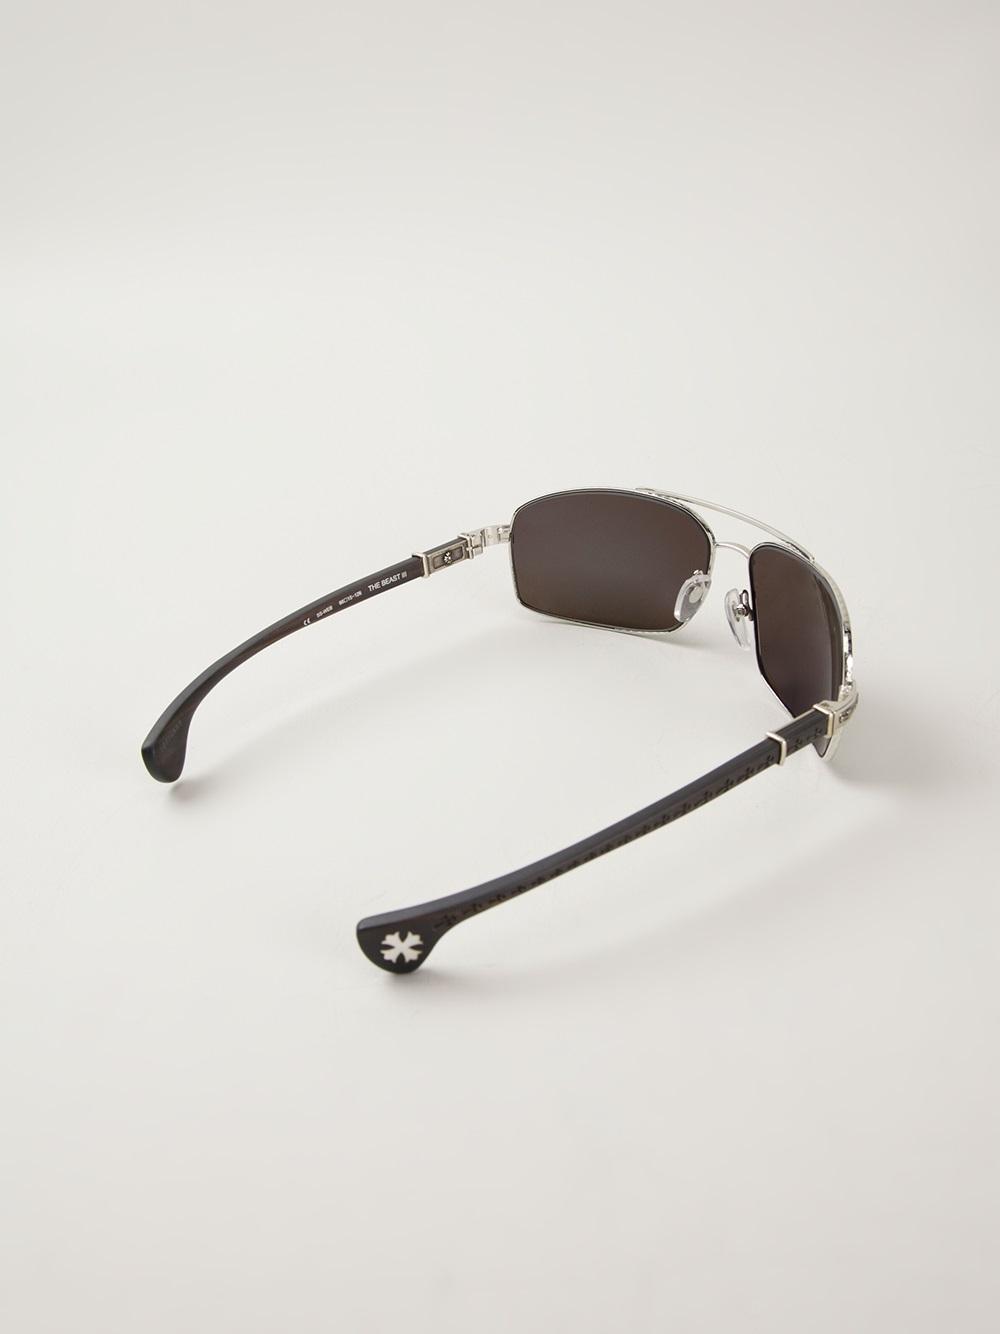 9b32cf240ff Lyst - Chrome Hearts The Beast Sunglasses in Black for Men